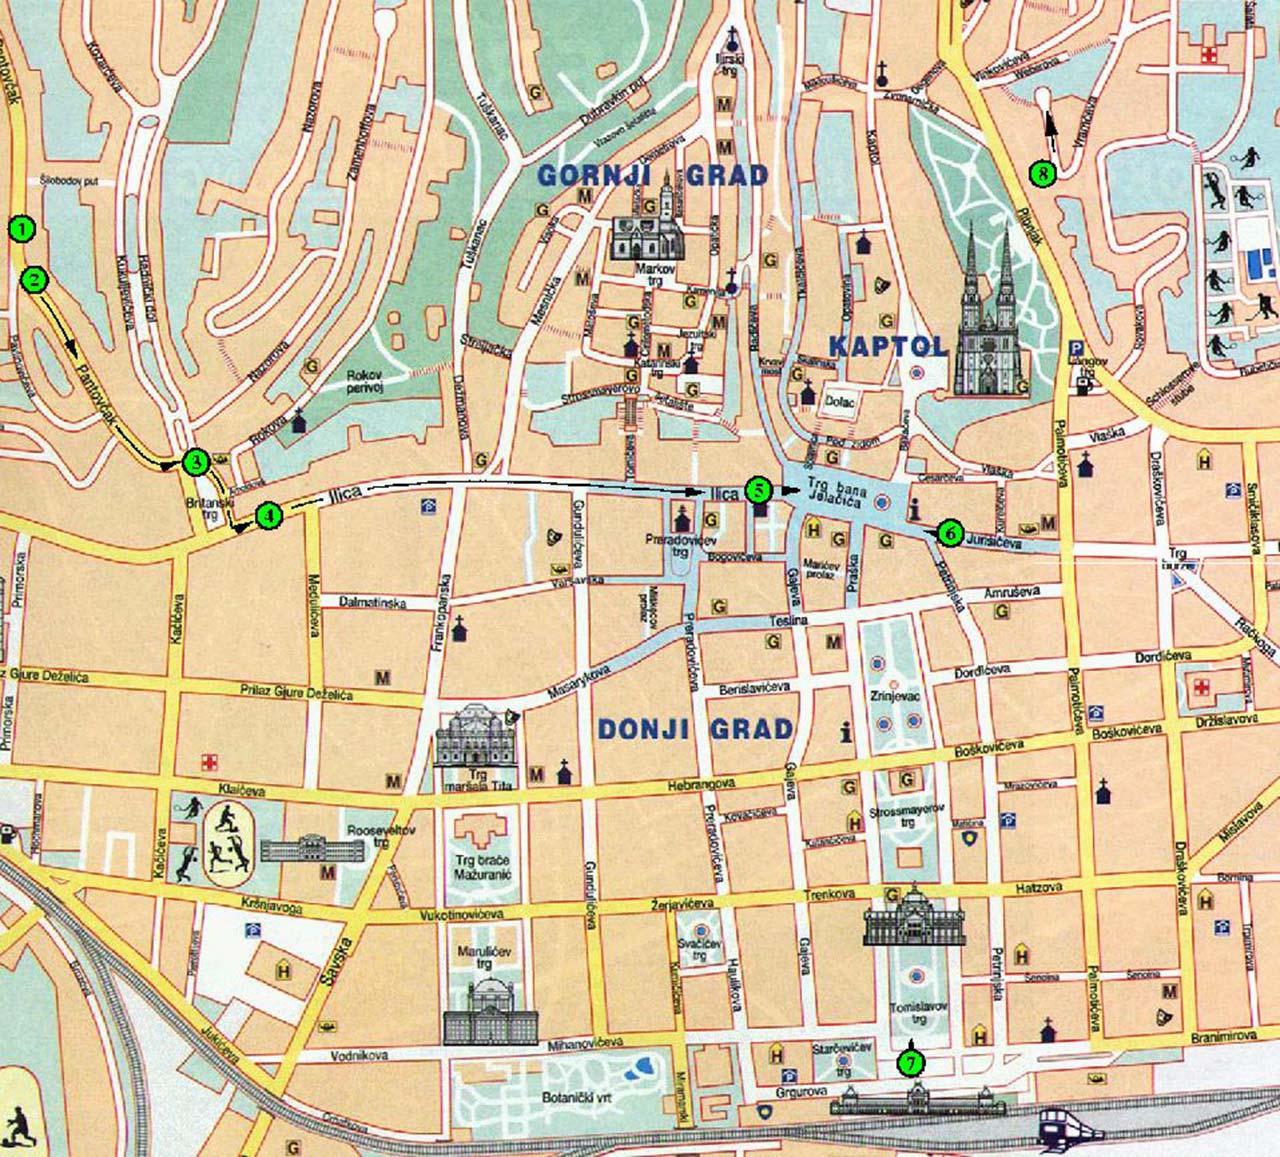 Awesome plan de zagreb gallery joshkrajcik joshkrajcik mapas de zagreb cro cia mapasblog thecheapjerseys Gallery